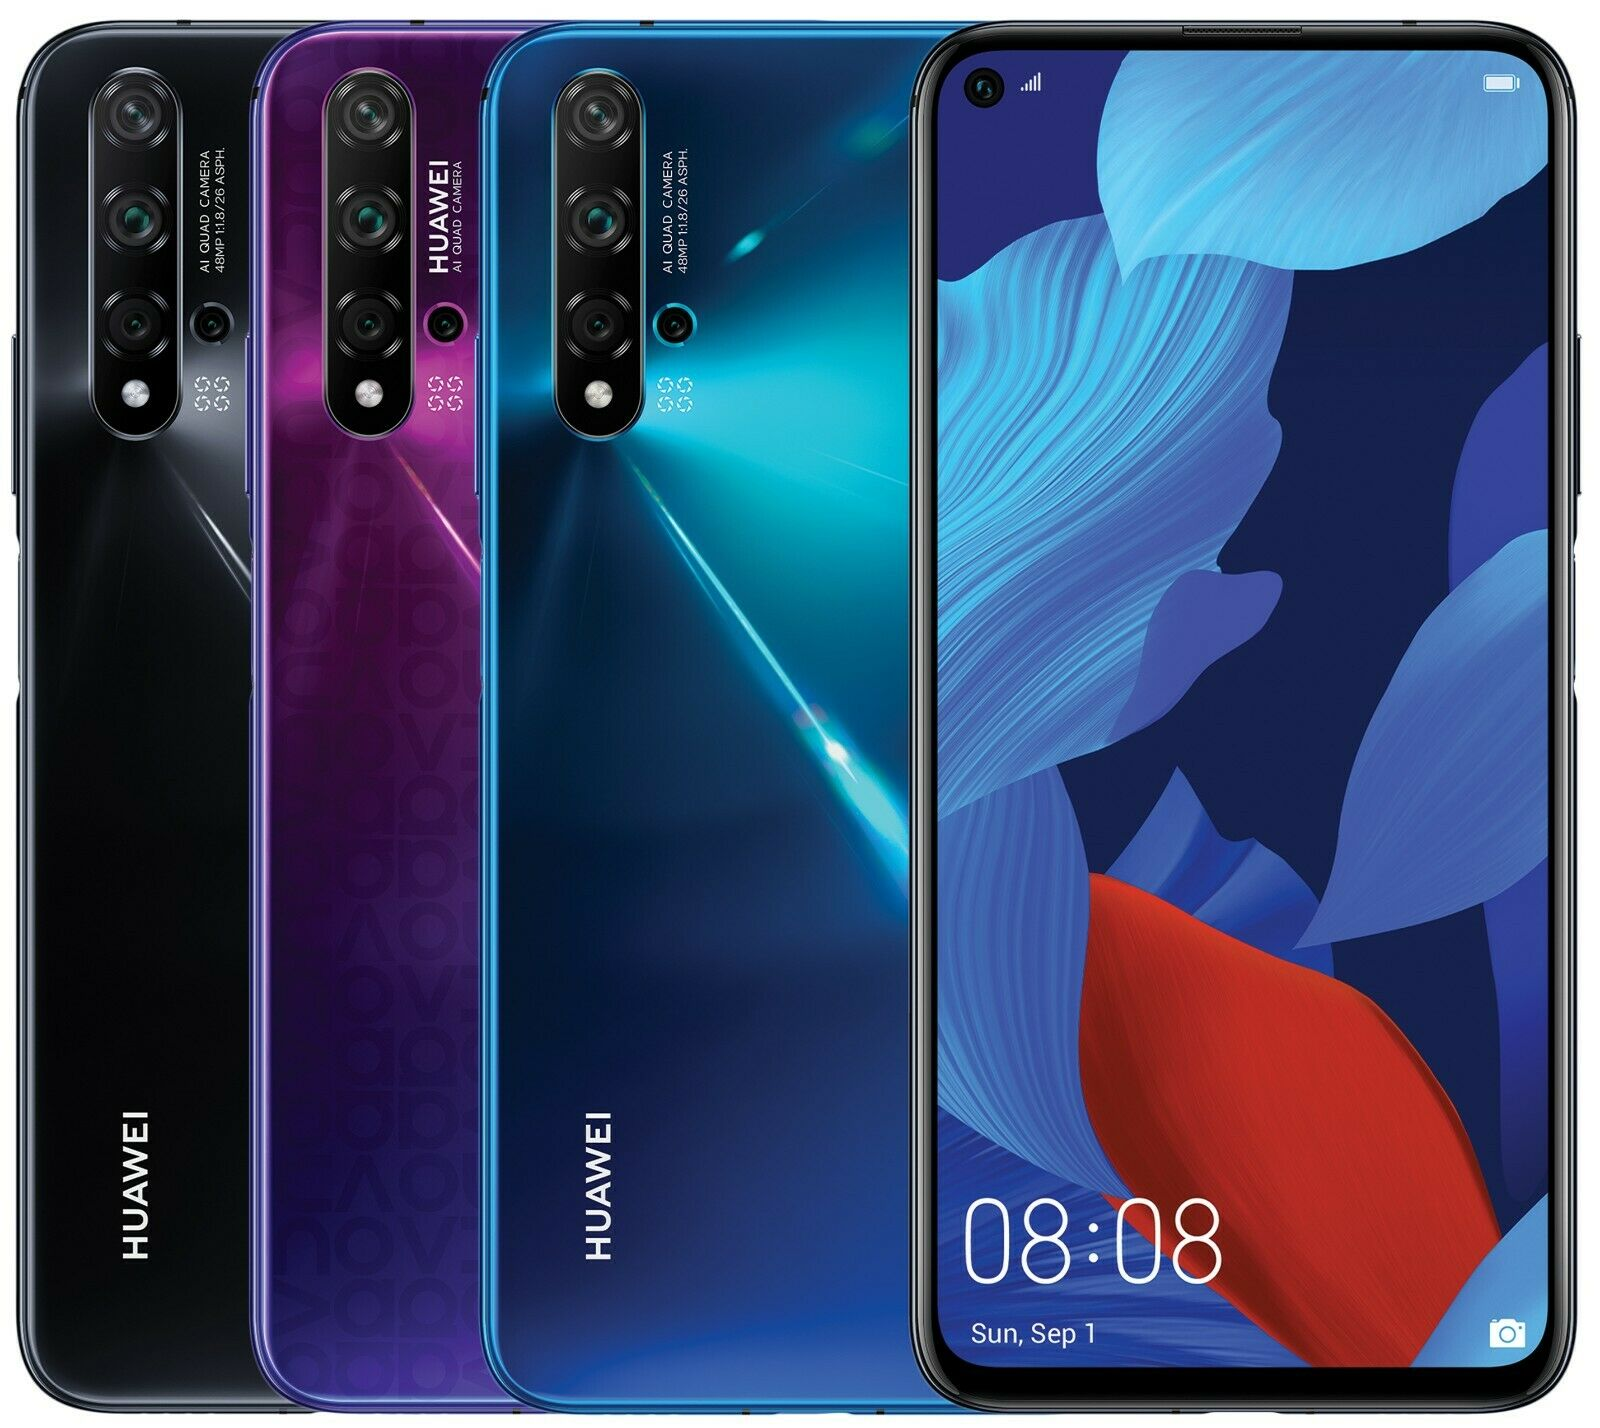 Huawei Nova 5T YAL-L21 128GB 8GB RAM (FACTORY UNLOCKED) 6.26